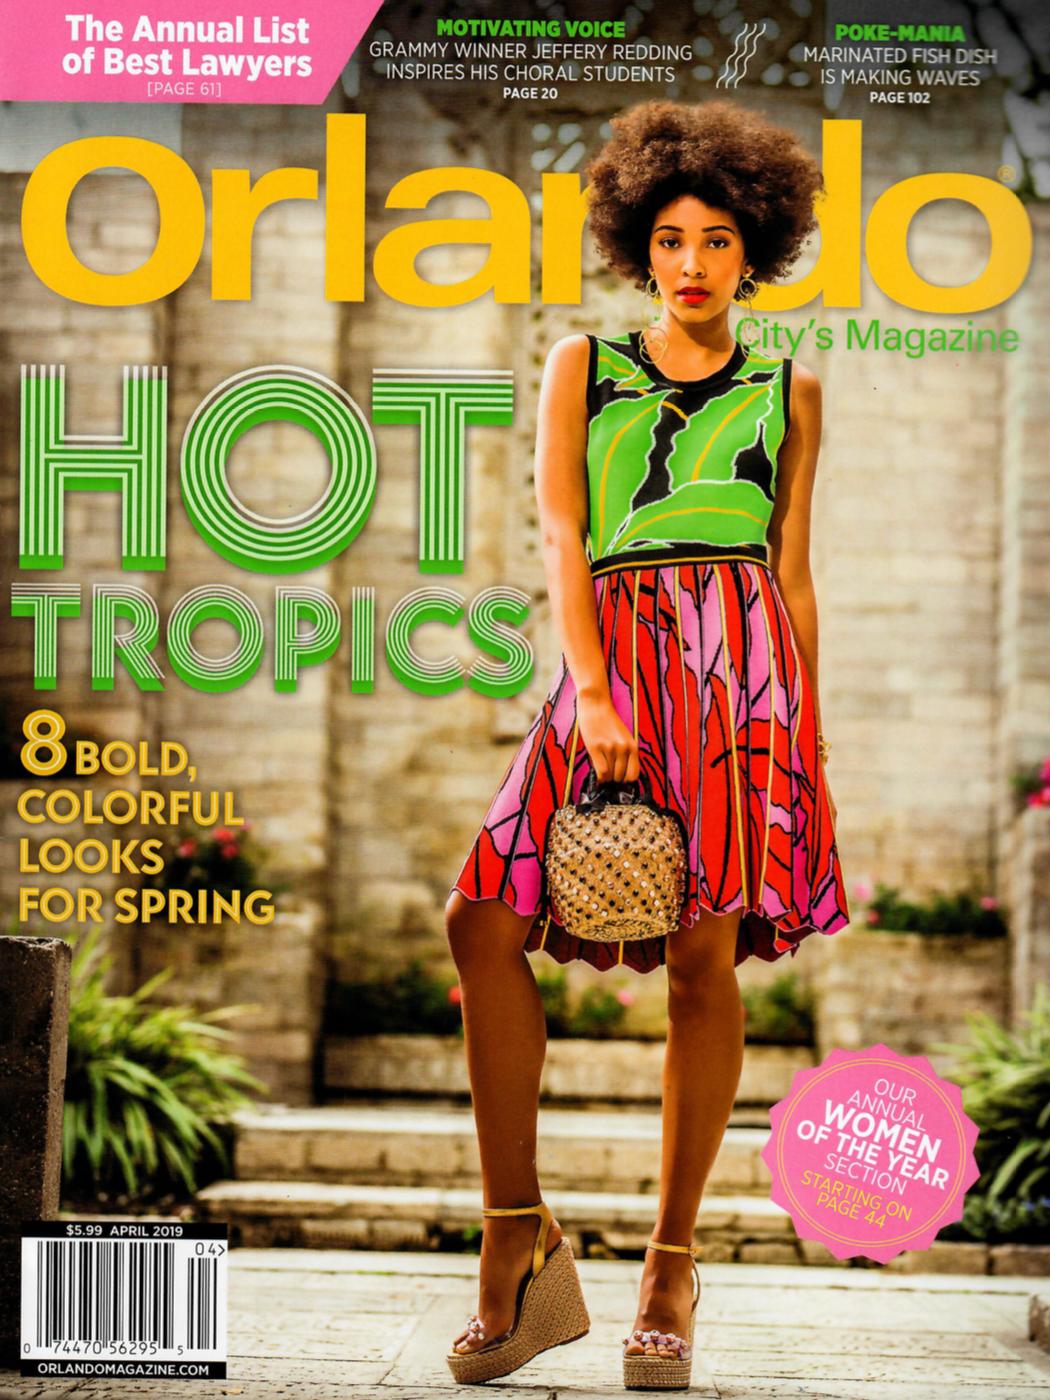 orlando-citys-magazine.png